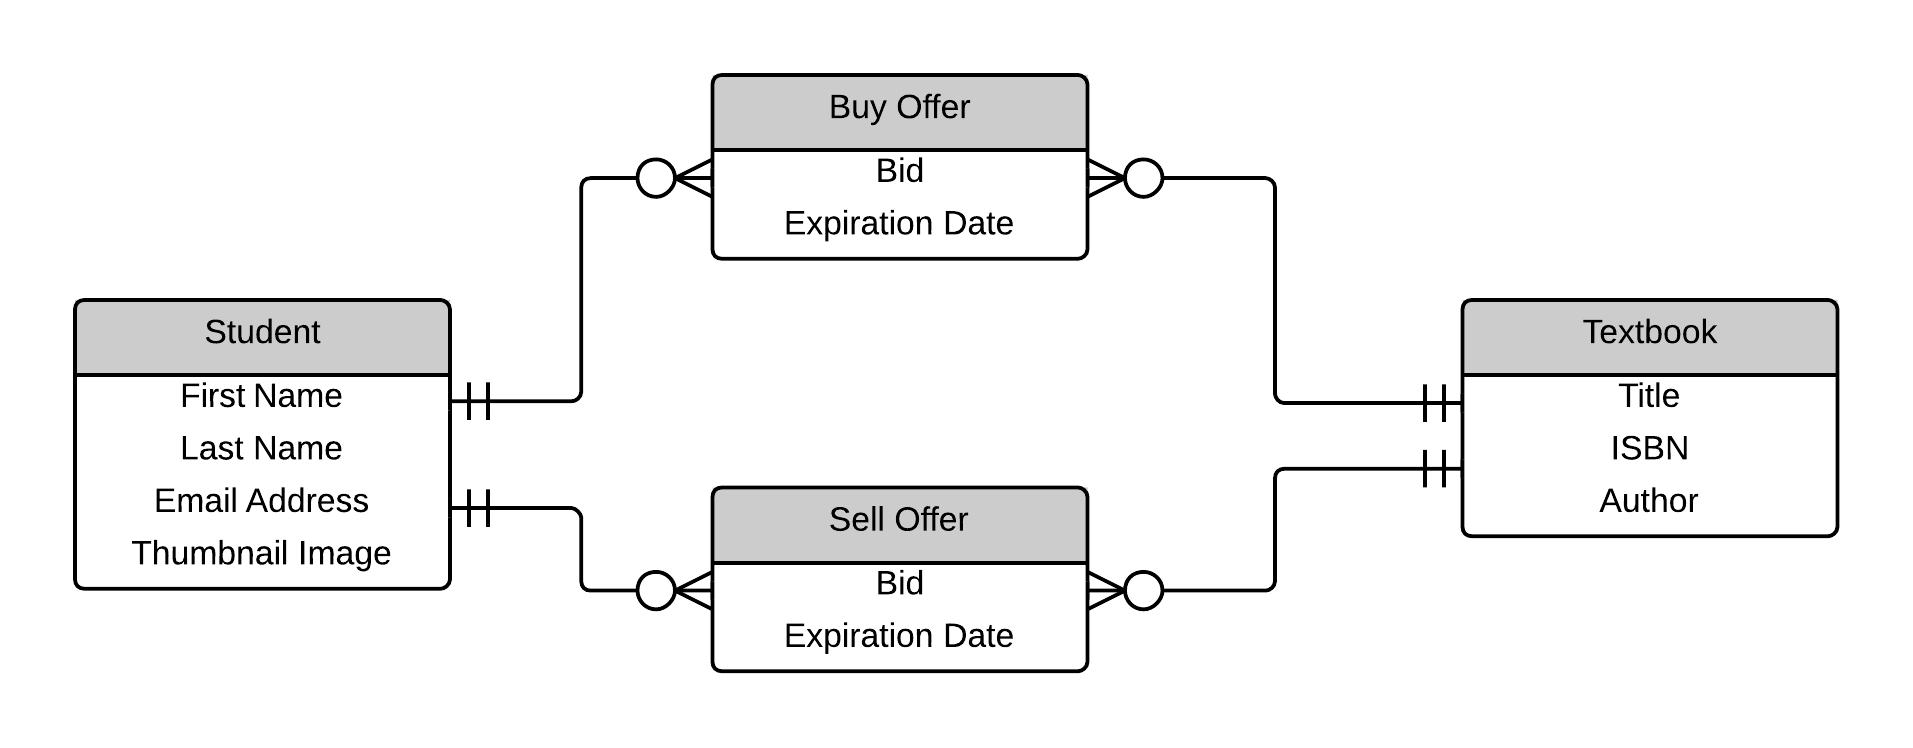 Textbook Mania Er Diagram Wod | Evan Komiyama inside Entity Relationship Diagram One To Many